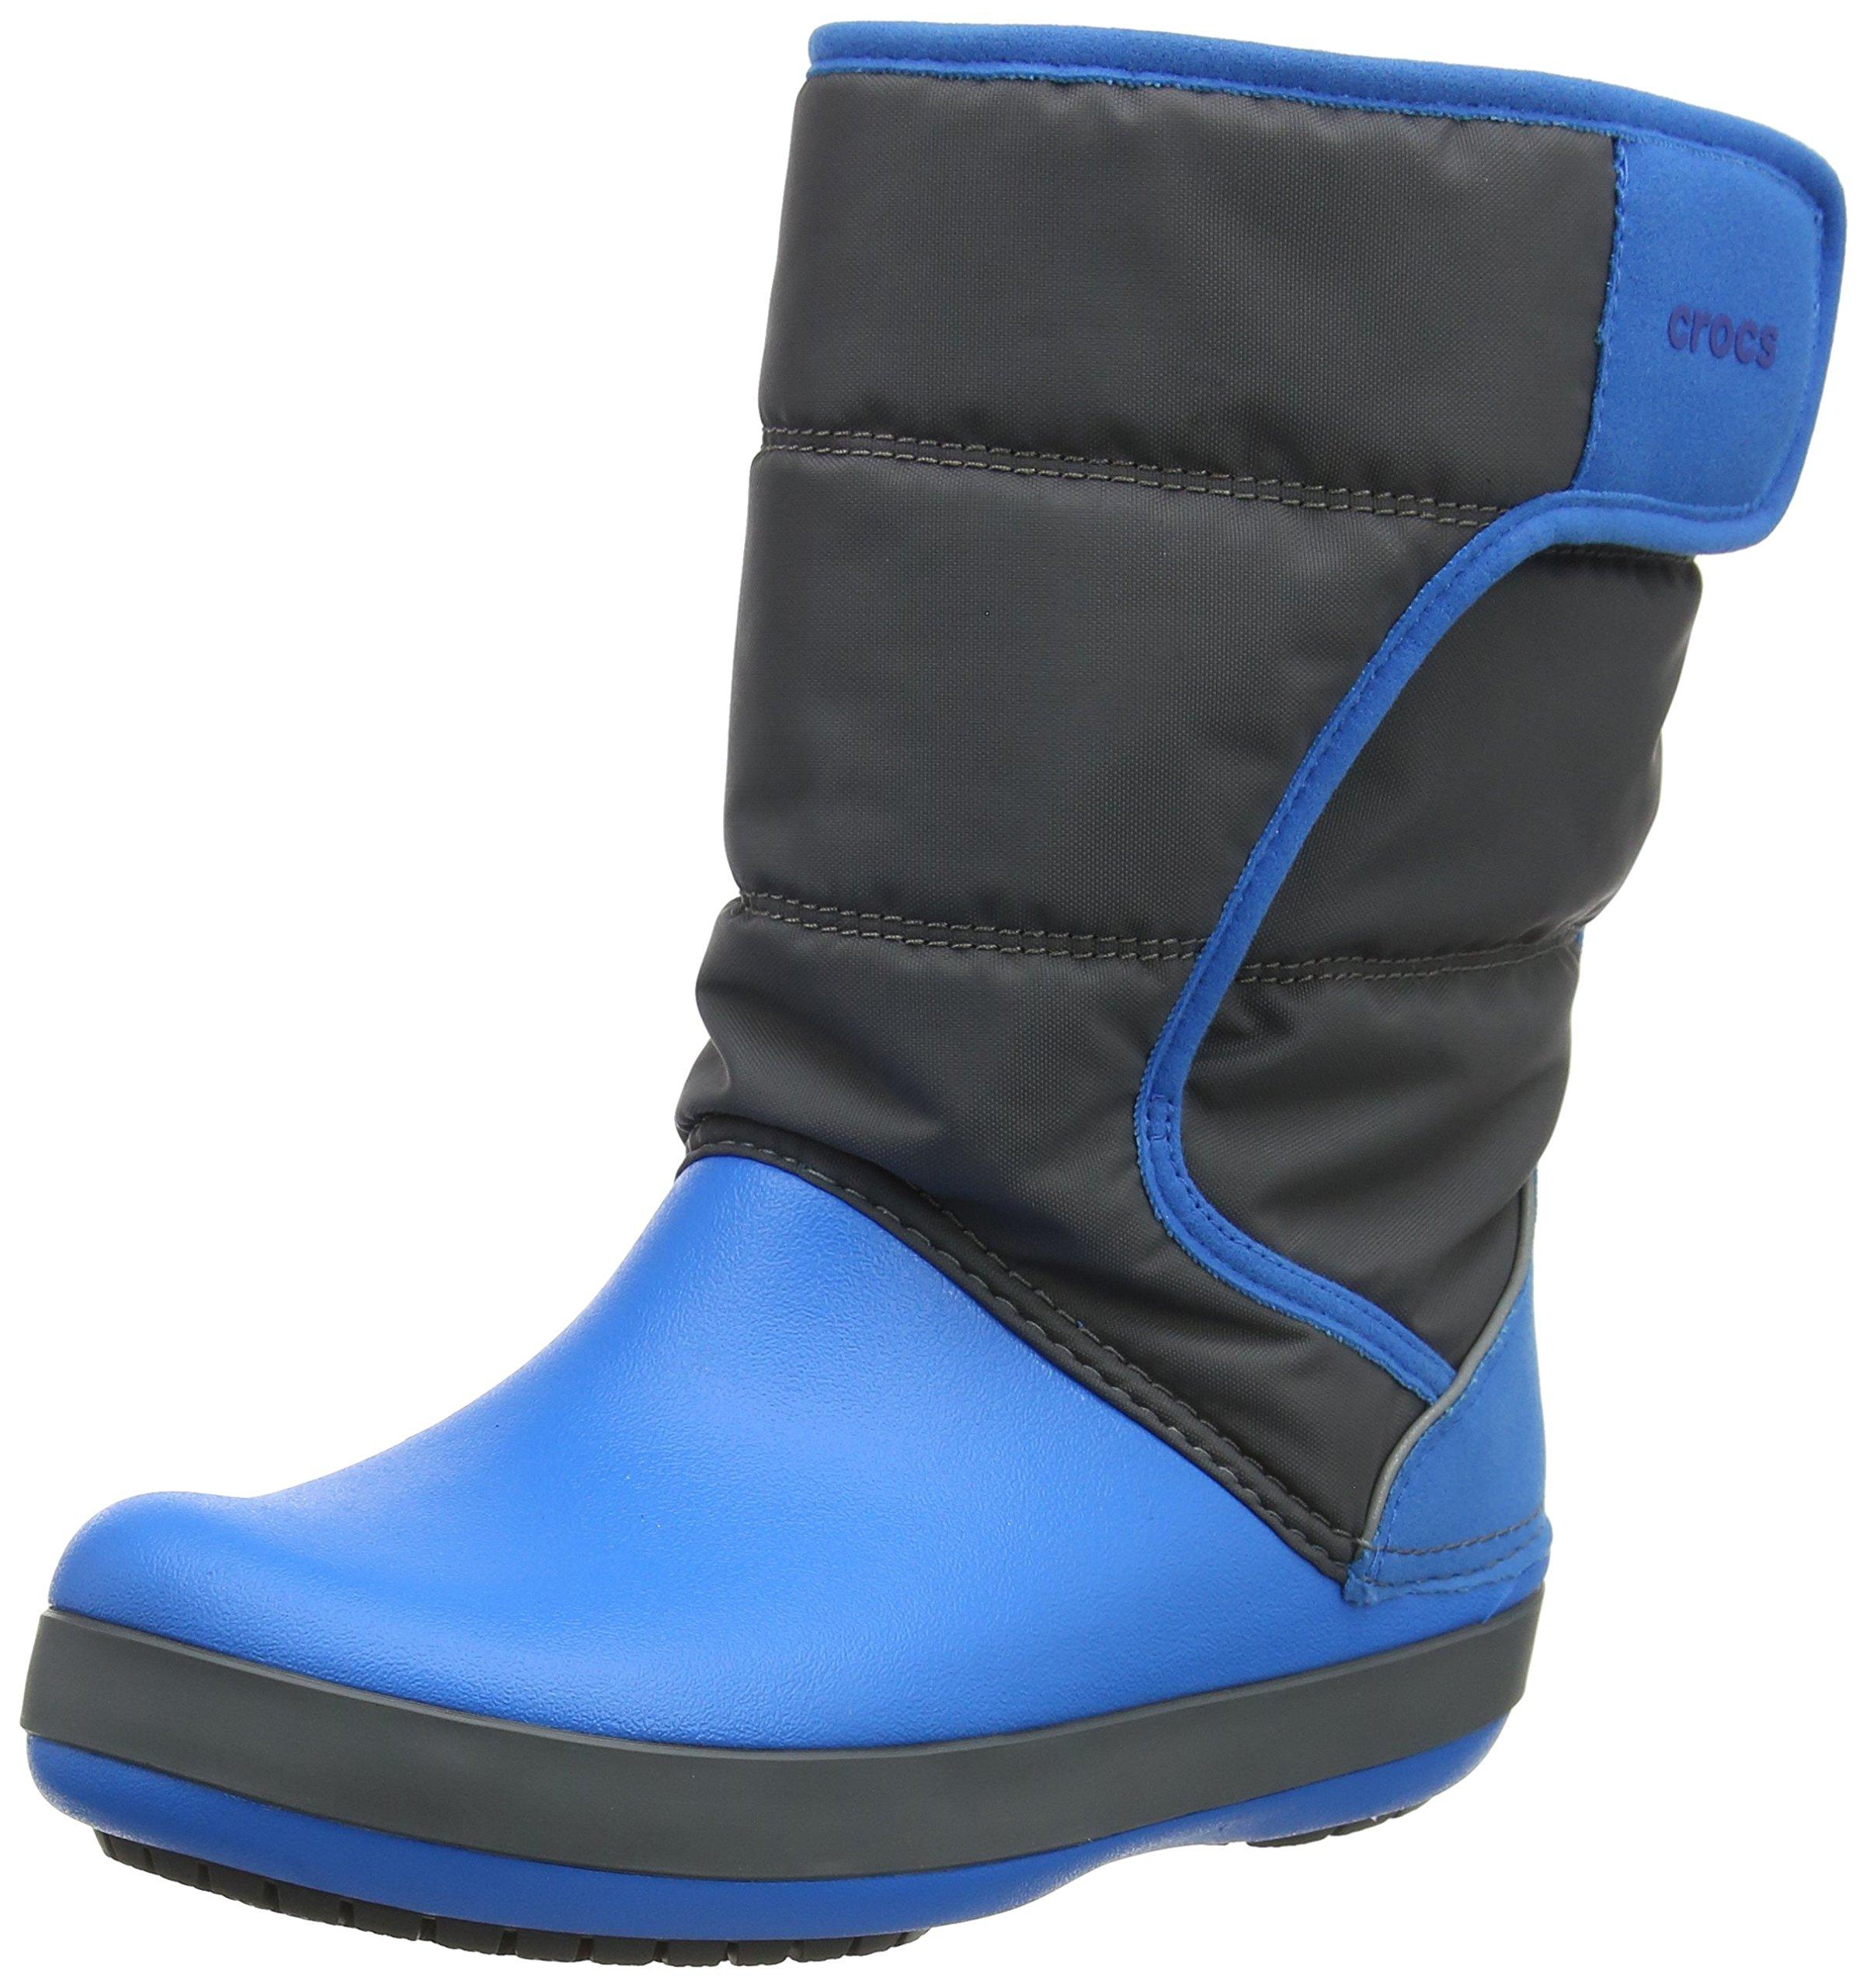 Crocs Lodge Point Snow Boot, Slate Grey/Ocean, 4 M US Big Kid